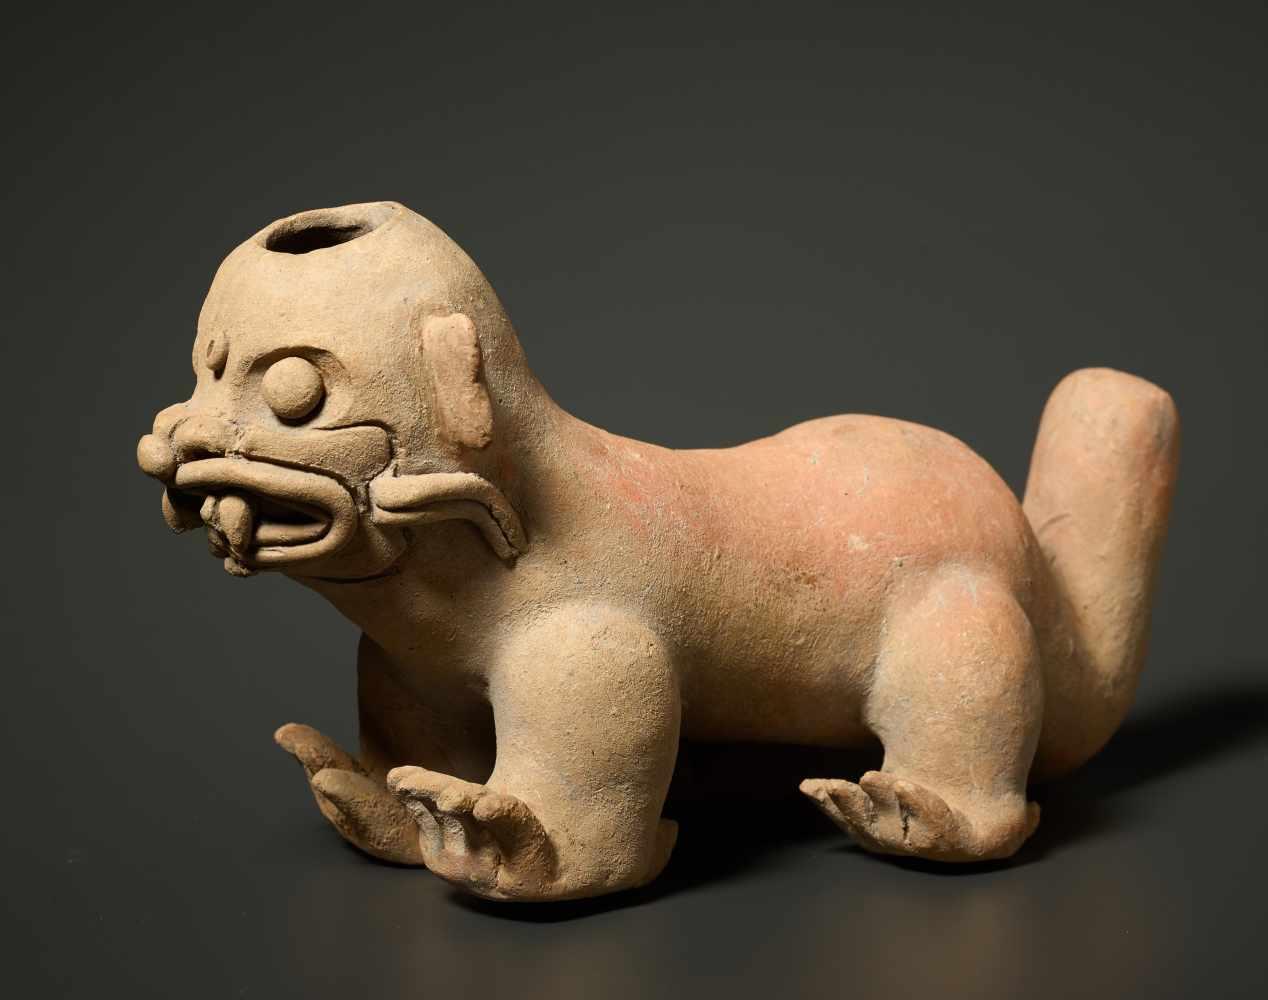 TL-TESTED JAGUAR VESSELFired clay Pre-Columbian America, La Tolita, approx. 4th cent.TL-test - Image 2 of 4